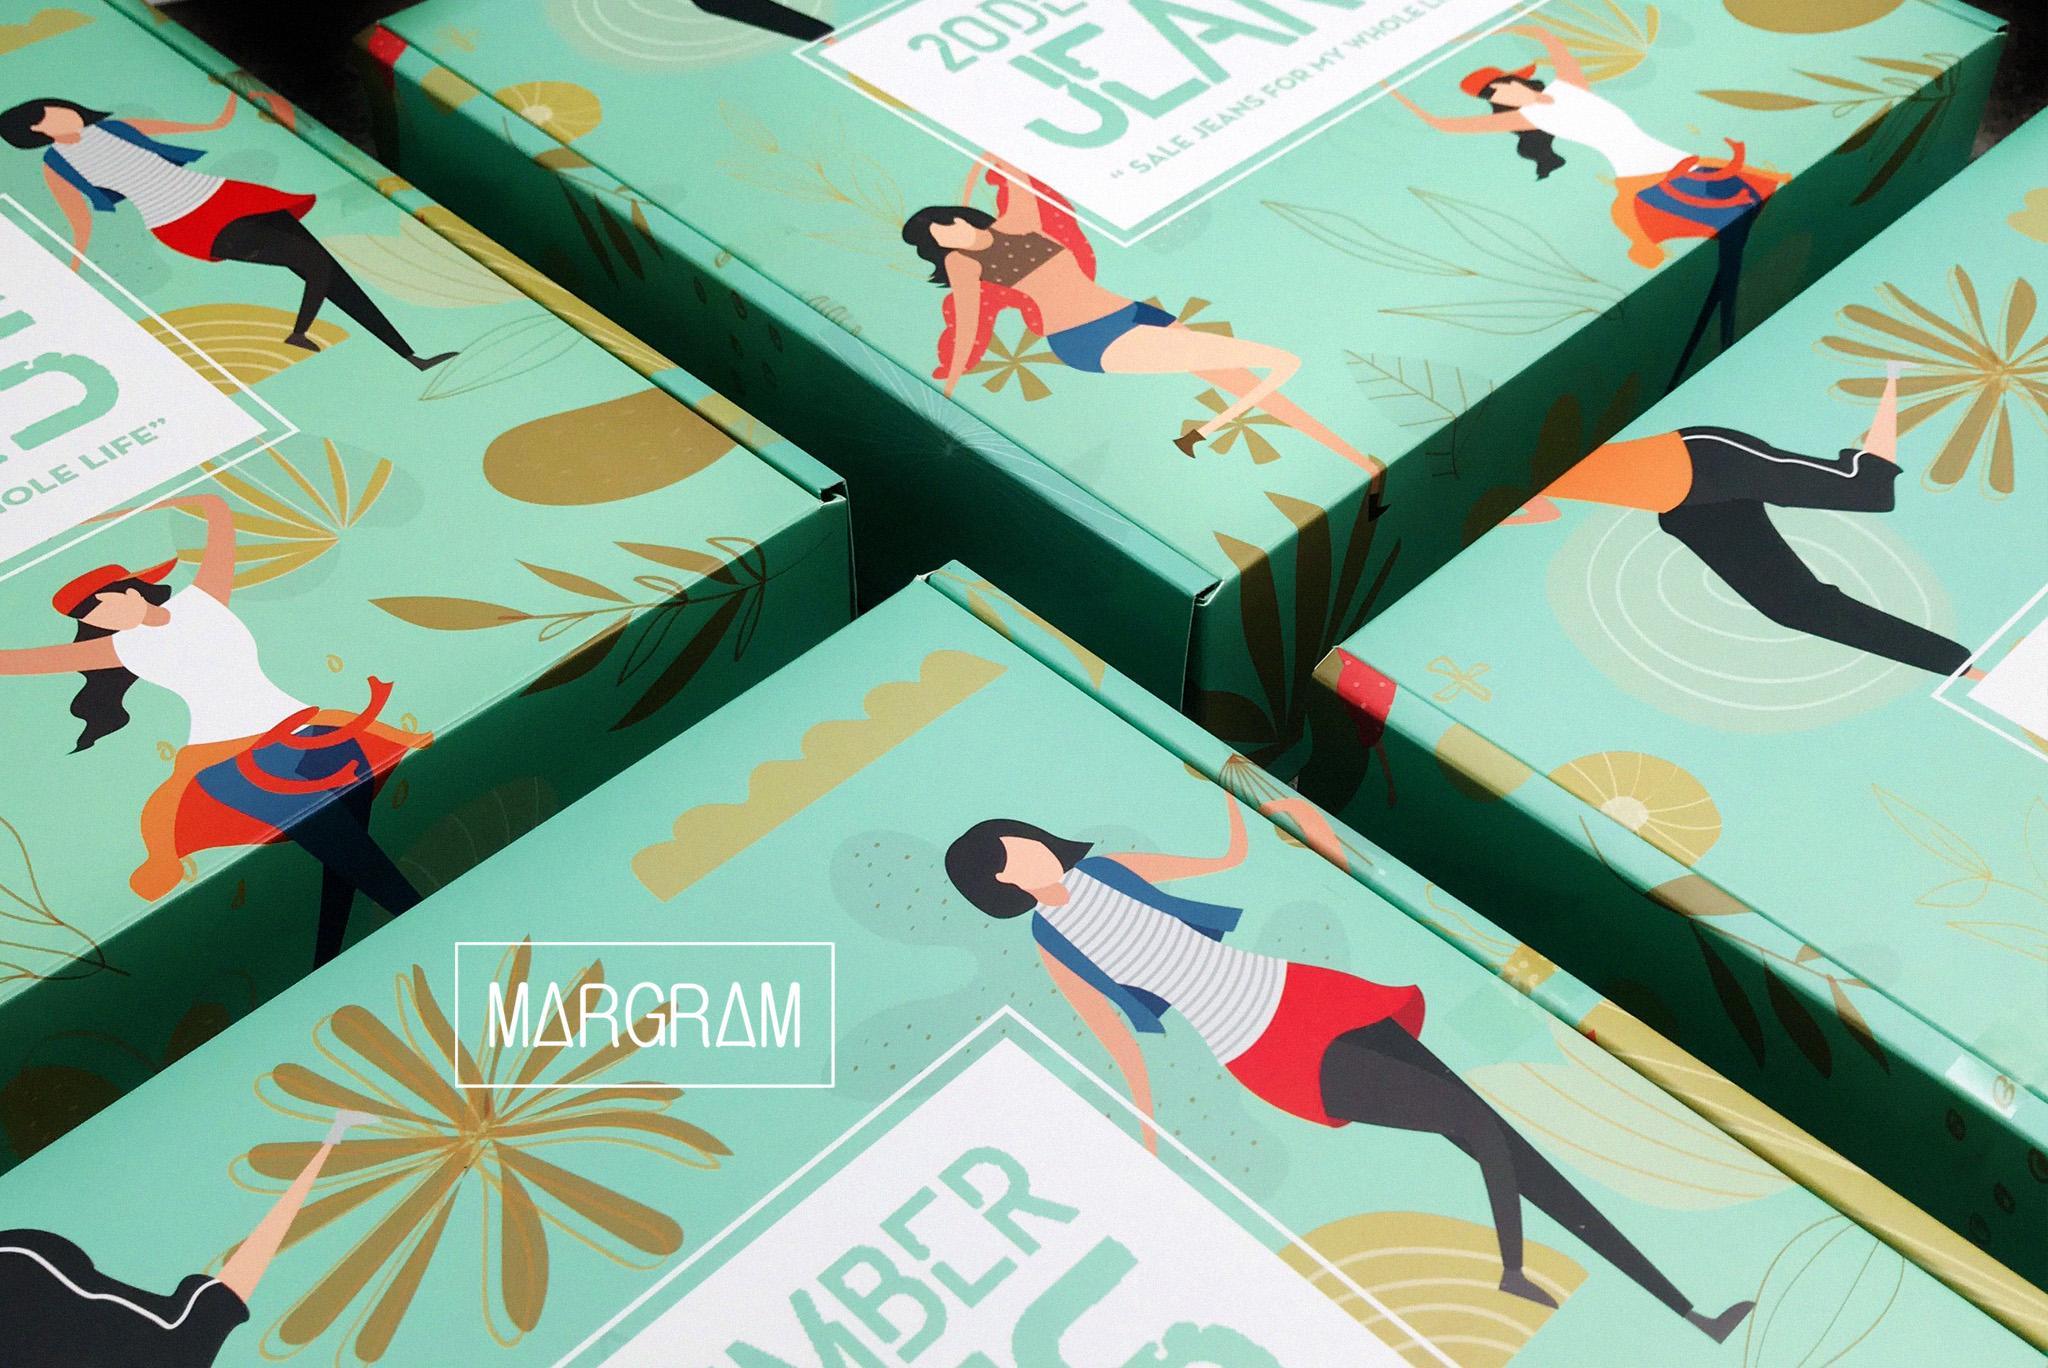 hop-thoi-trang-20-december-jeans-margram-04